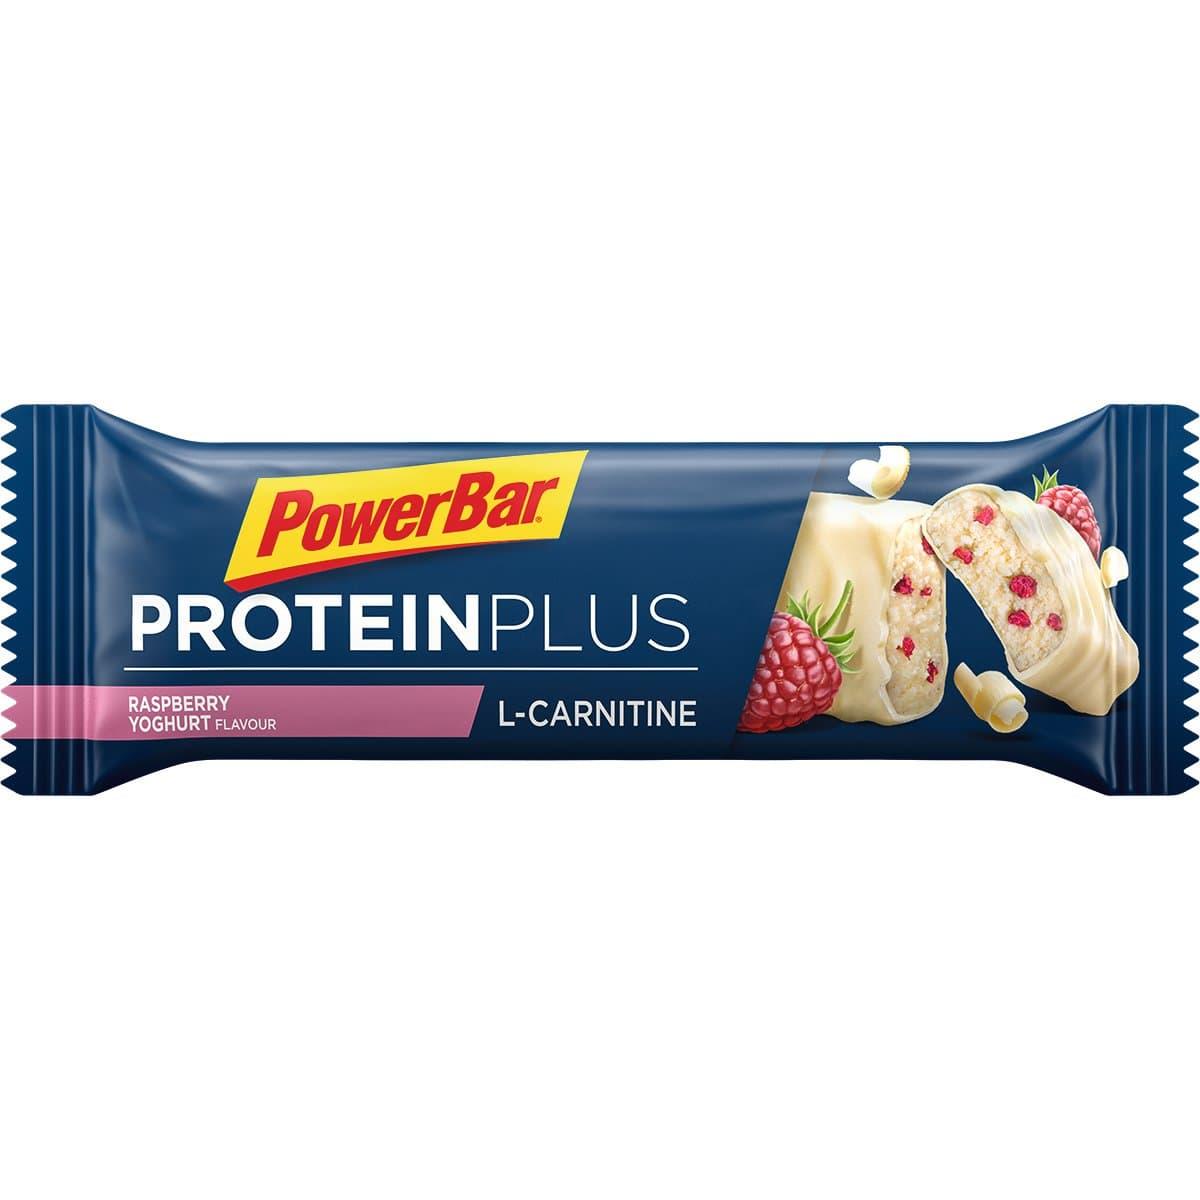 Powerbar Protein Plus L-Carnitin Riegel Himbeer Riegel